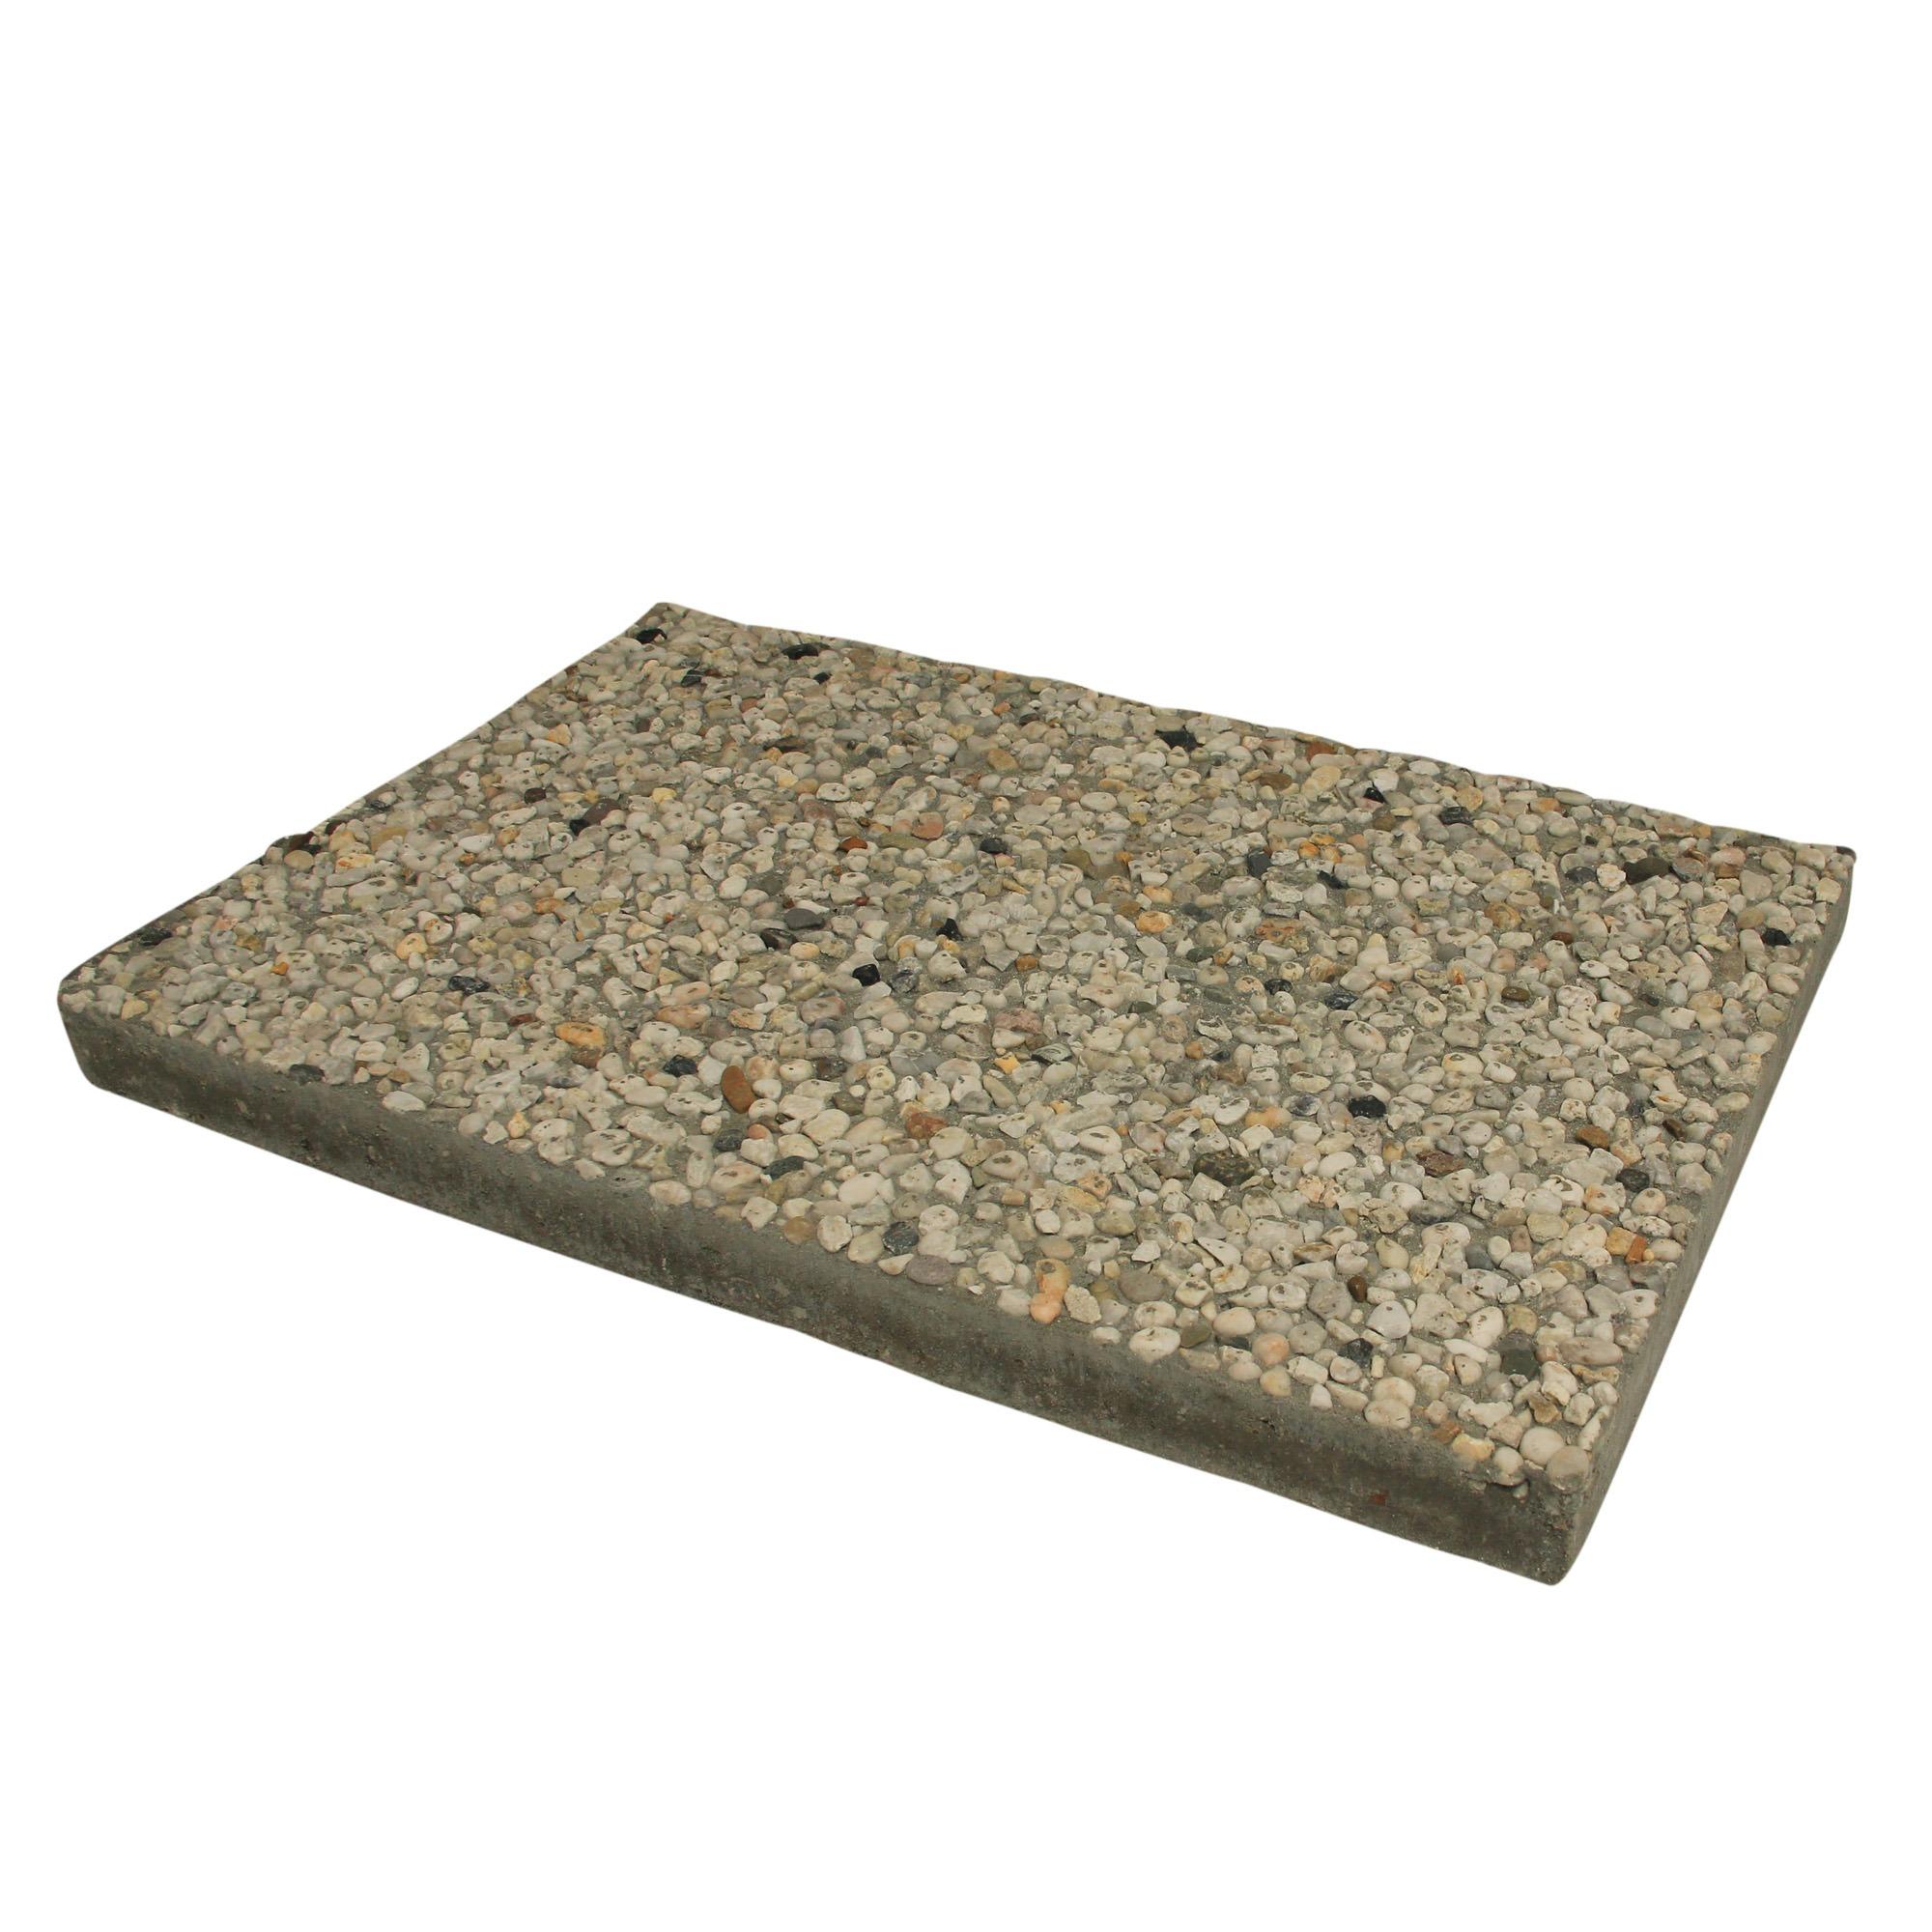 Grindtegel Wit/Geel 60x40 cm - Per Tegel - 0,24 m2